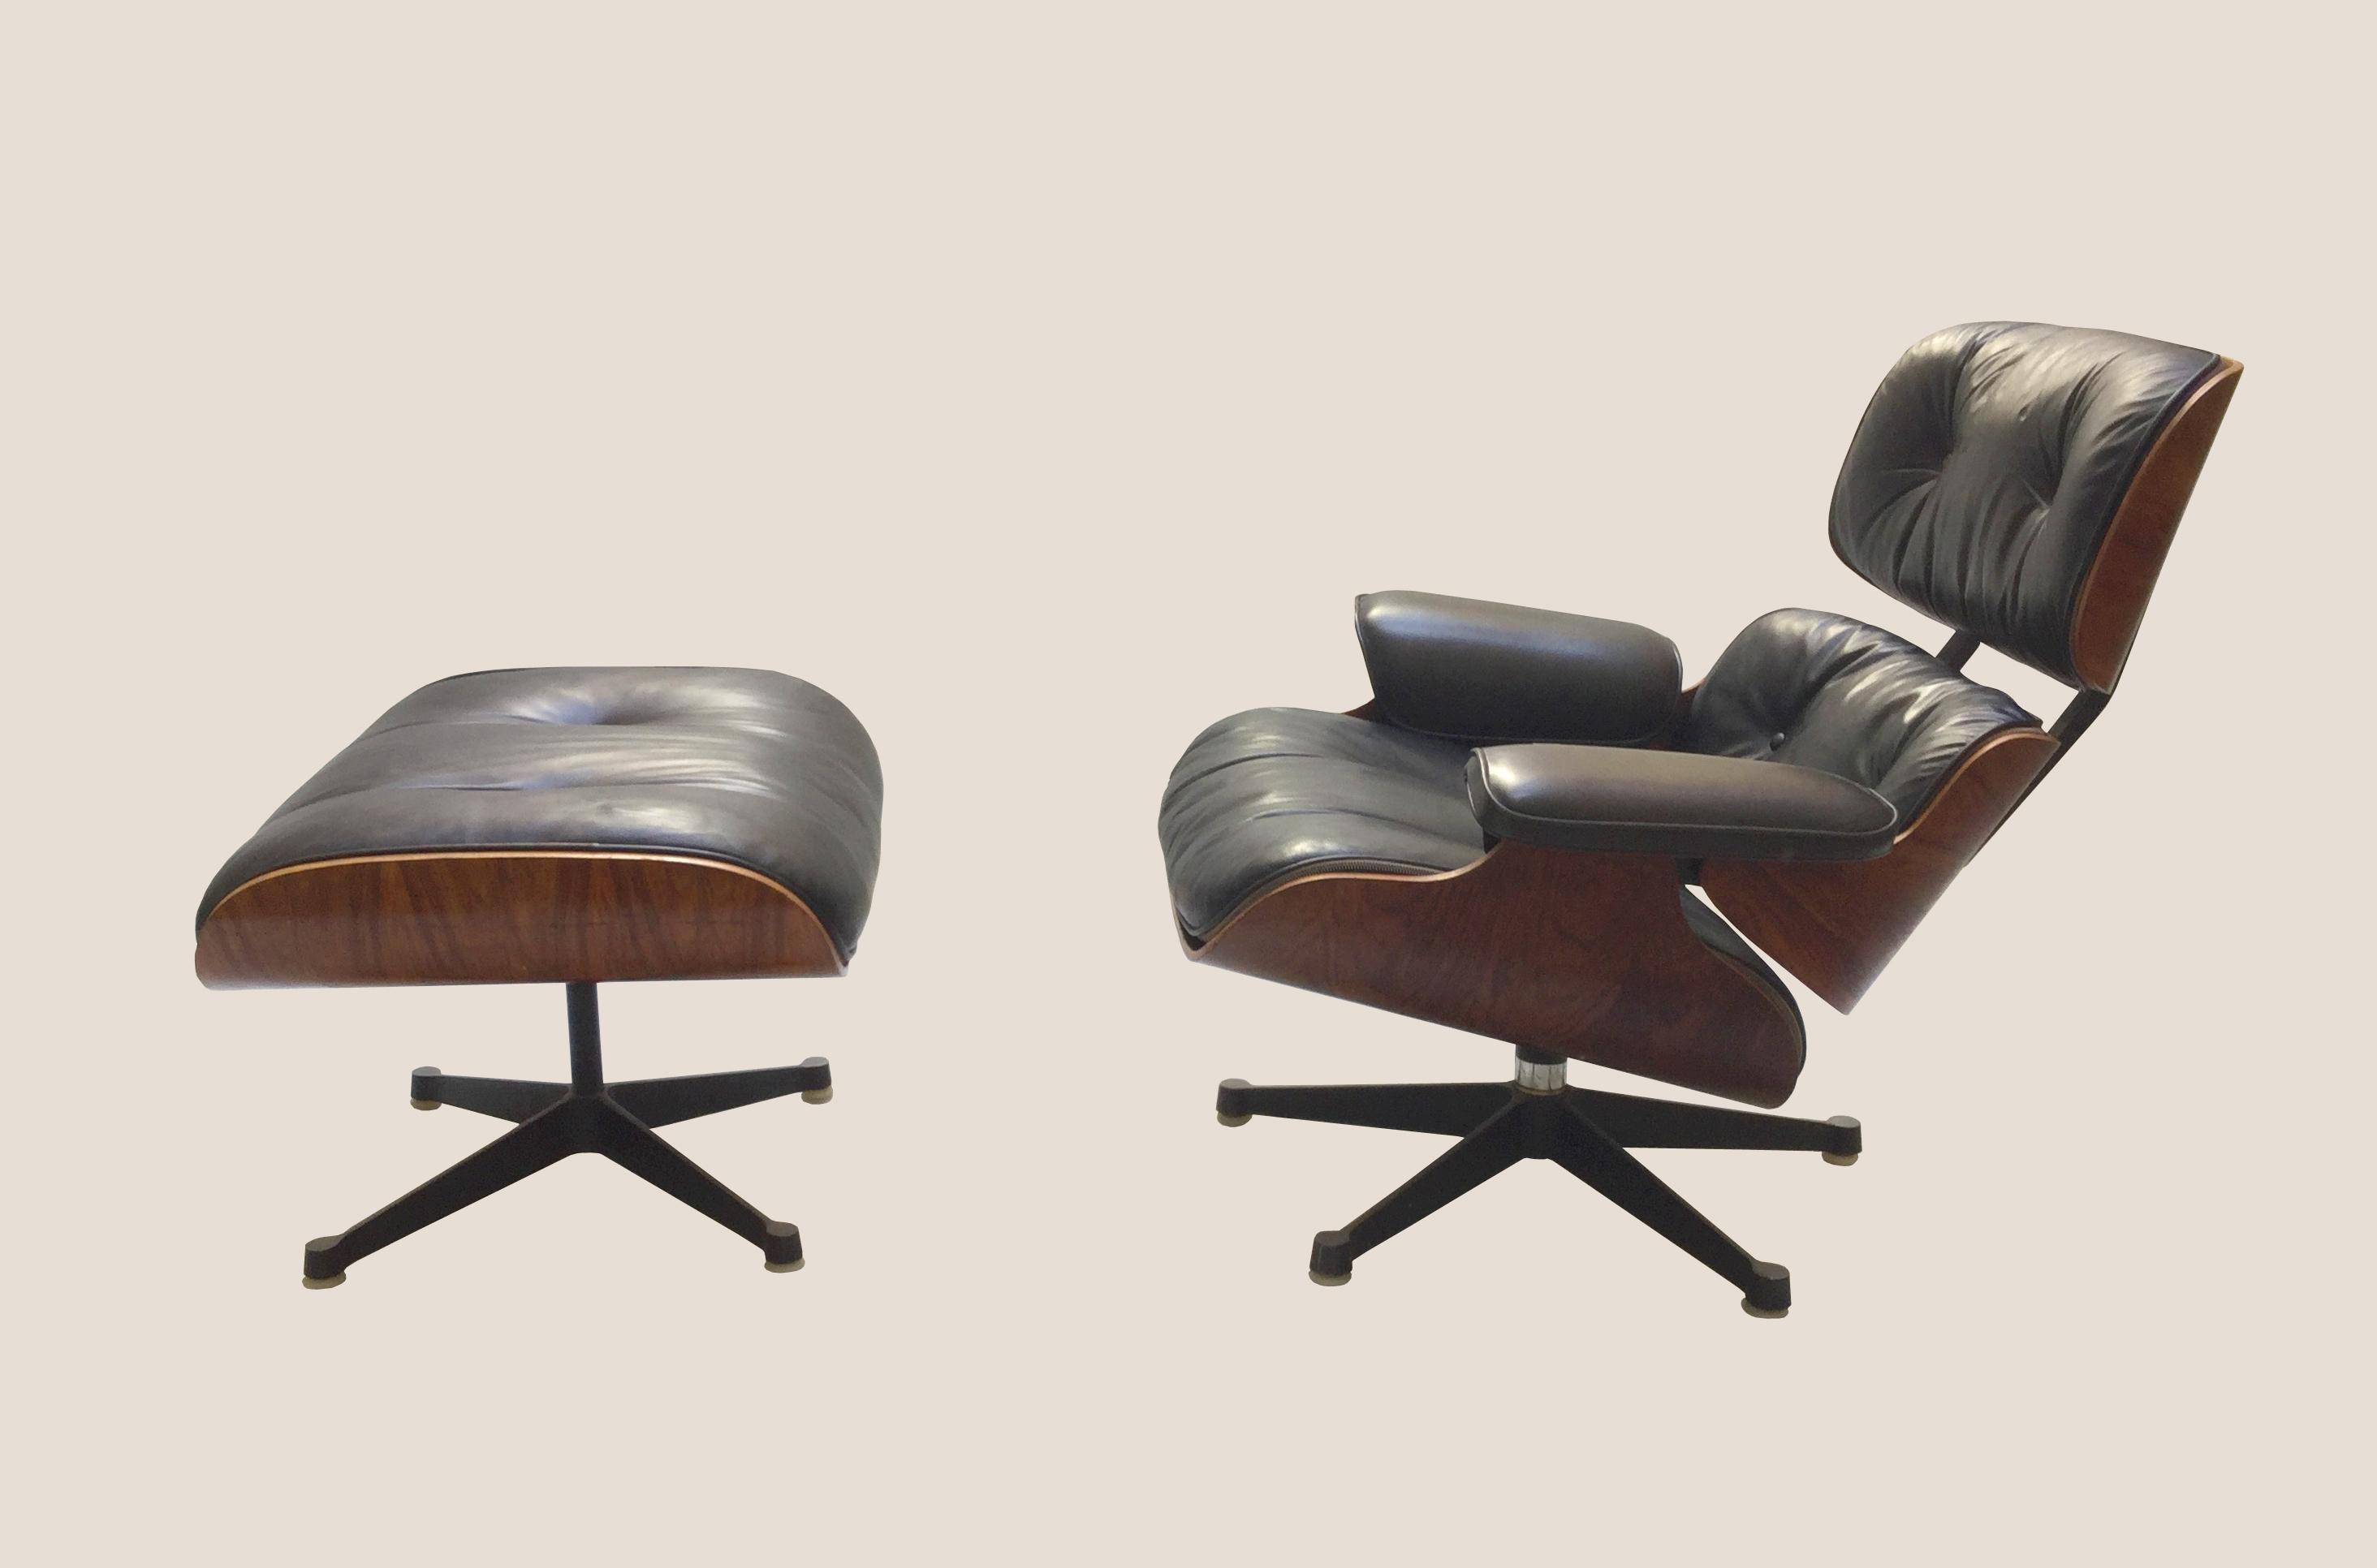 Eames Herman Miller 1